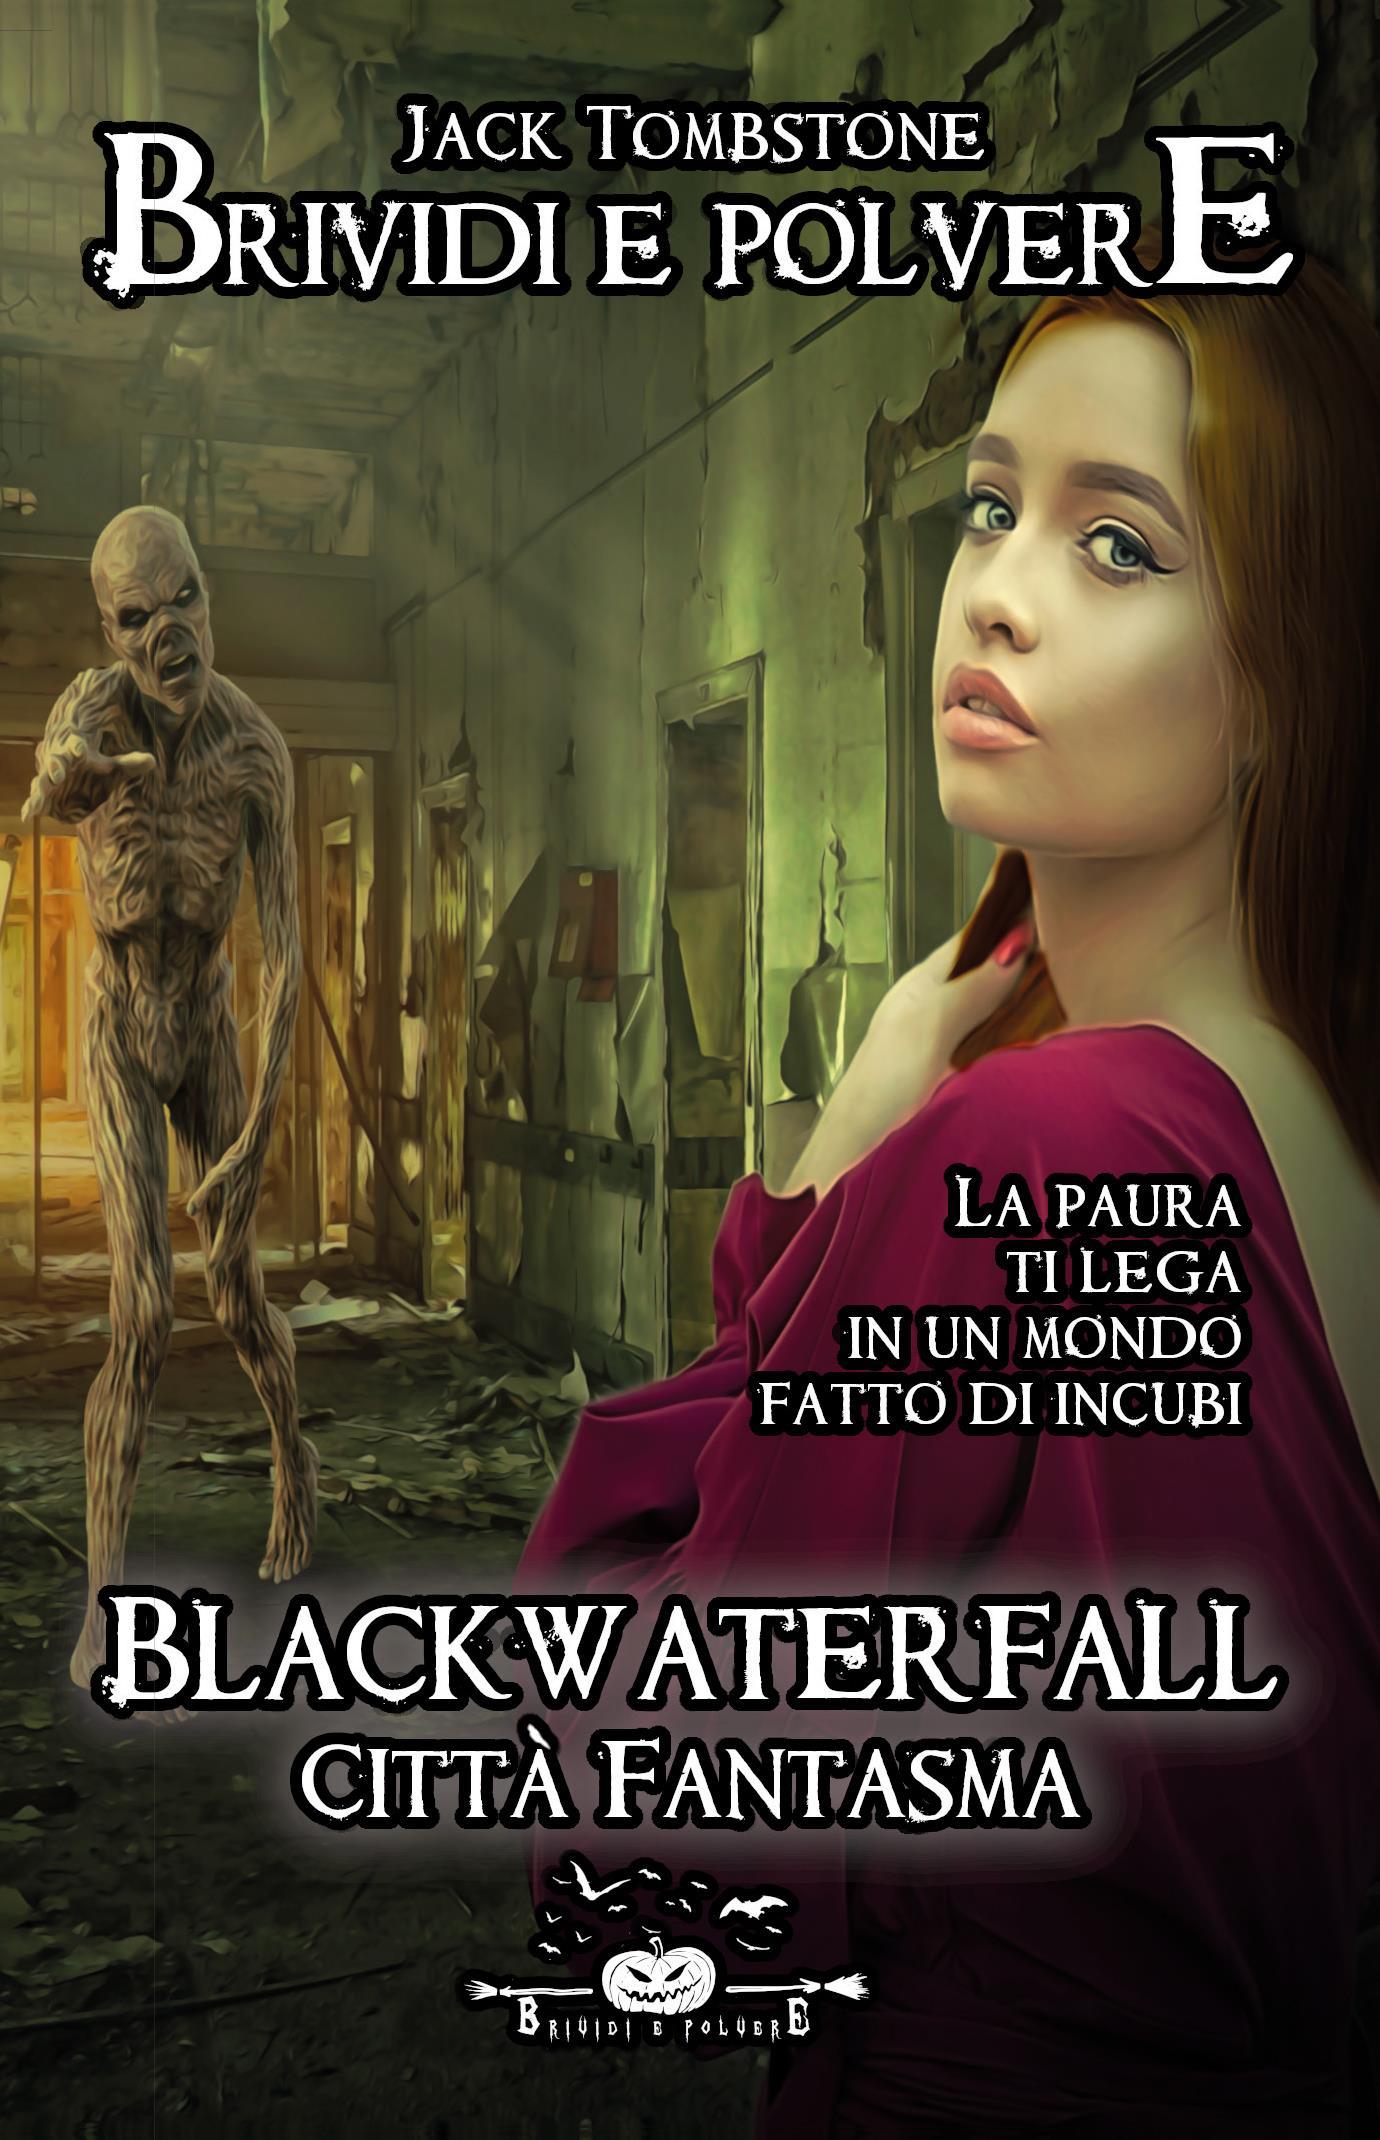 Blackwaterfall - Città Fantasma (Brividi e Polvere 1)